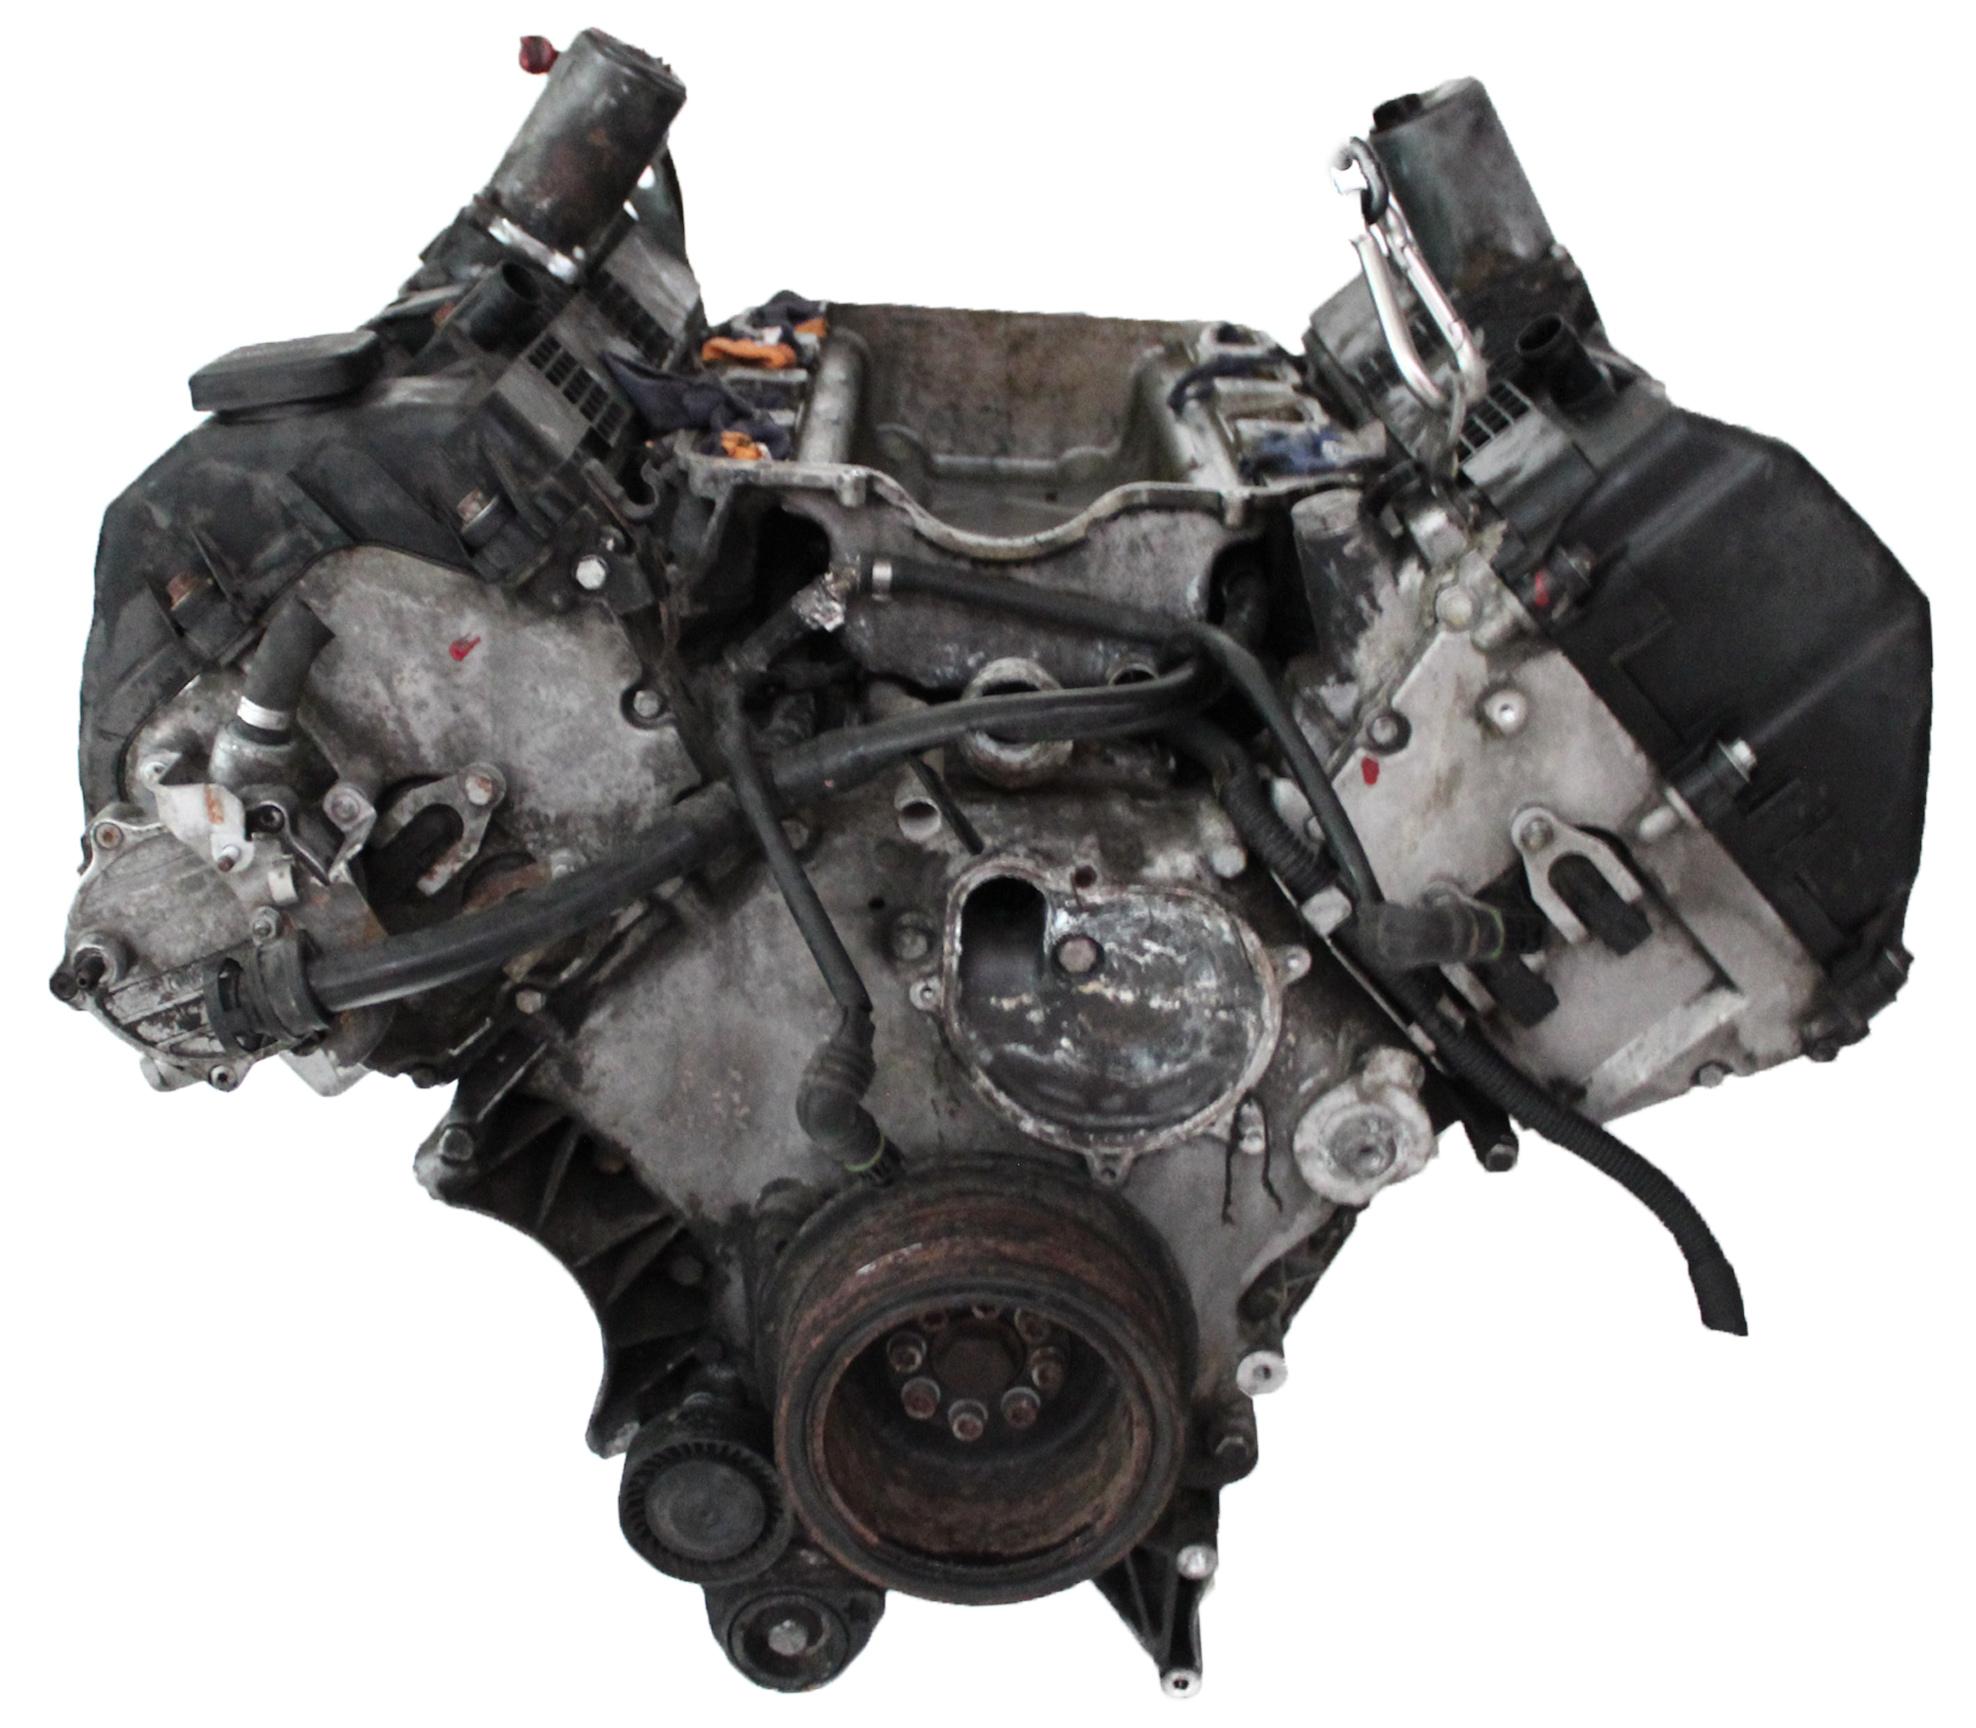 Motor 2002 BMW 7er E65 E66 E67 735 i il 3,6 Benzin N62B36A N62 mit Anbauteilen